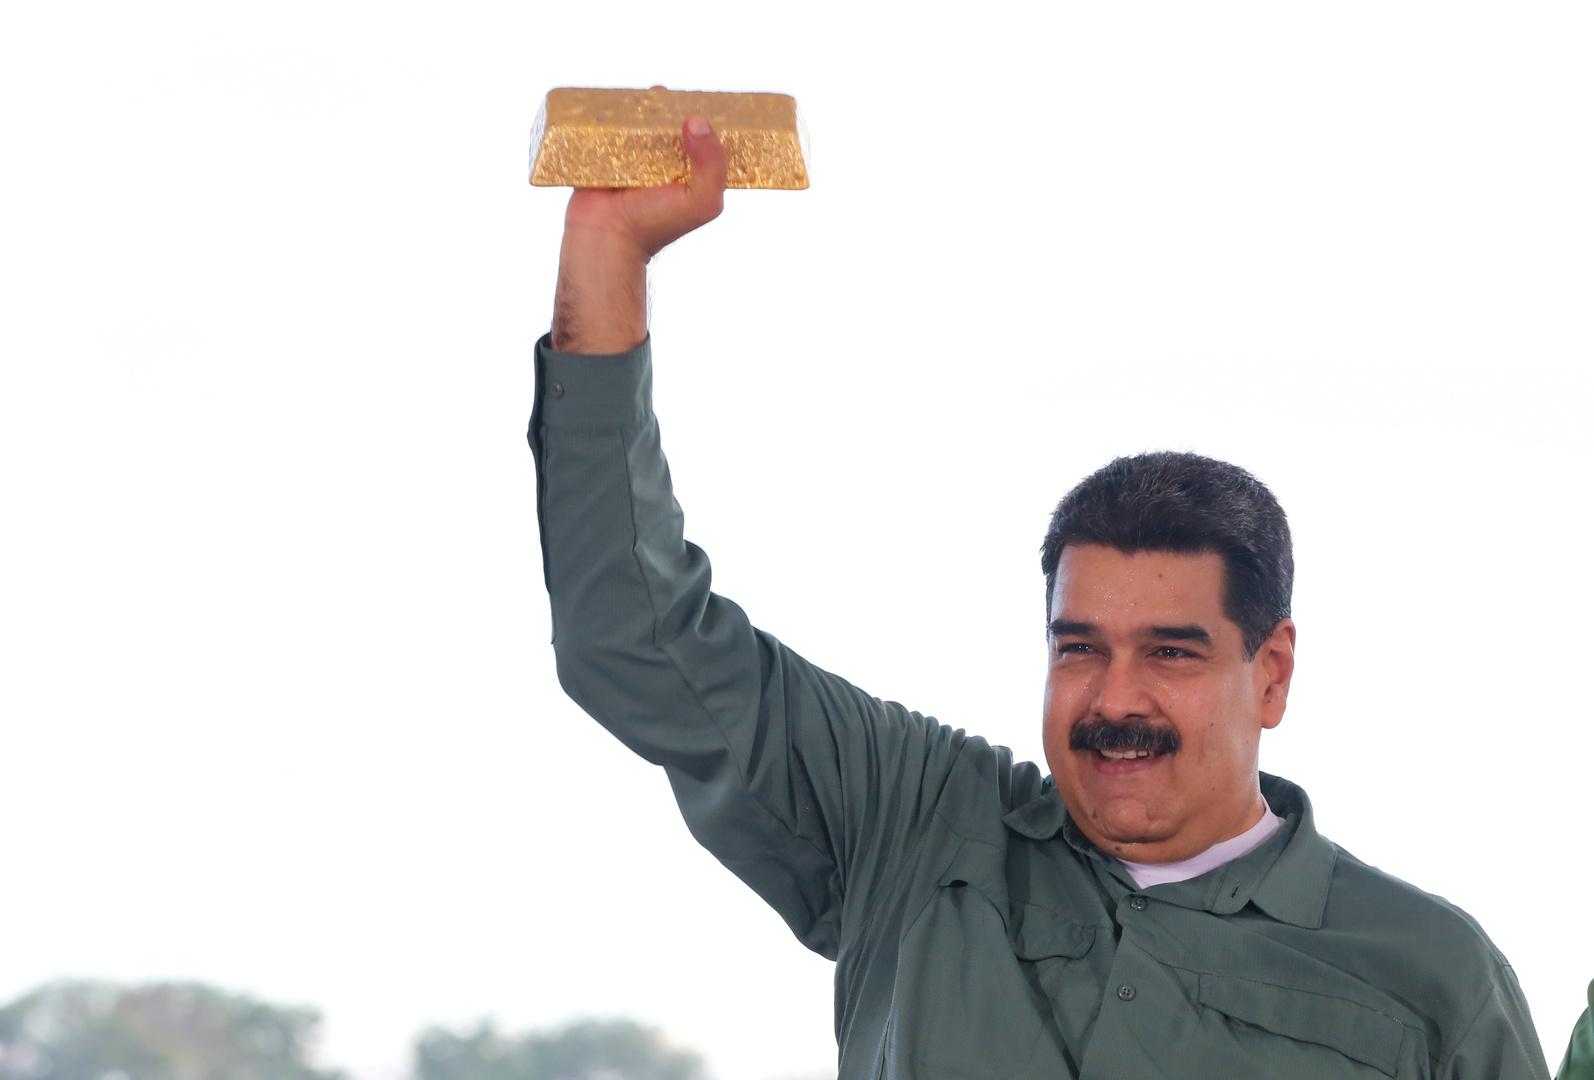 بريطانيا تجدد اعترافها بغوايدو رئيسا لفنزويلا